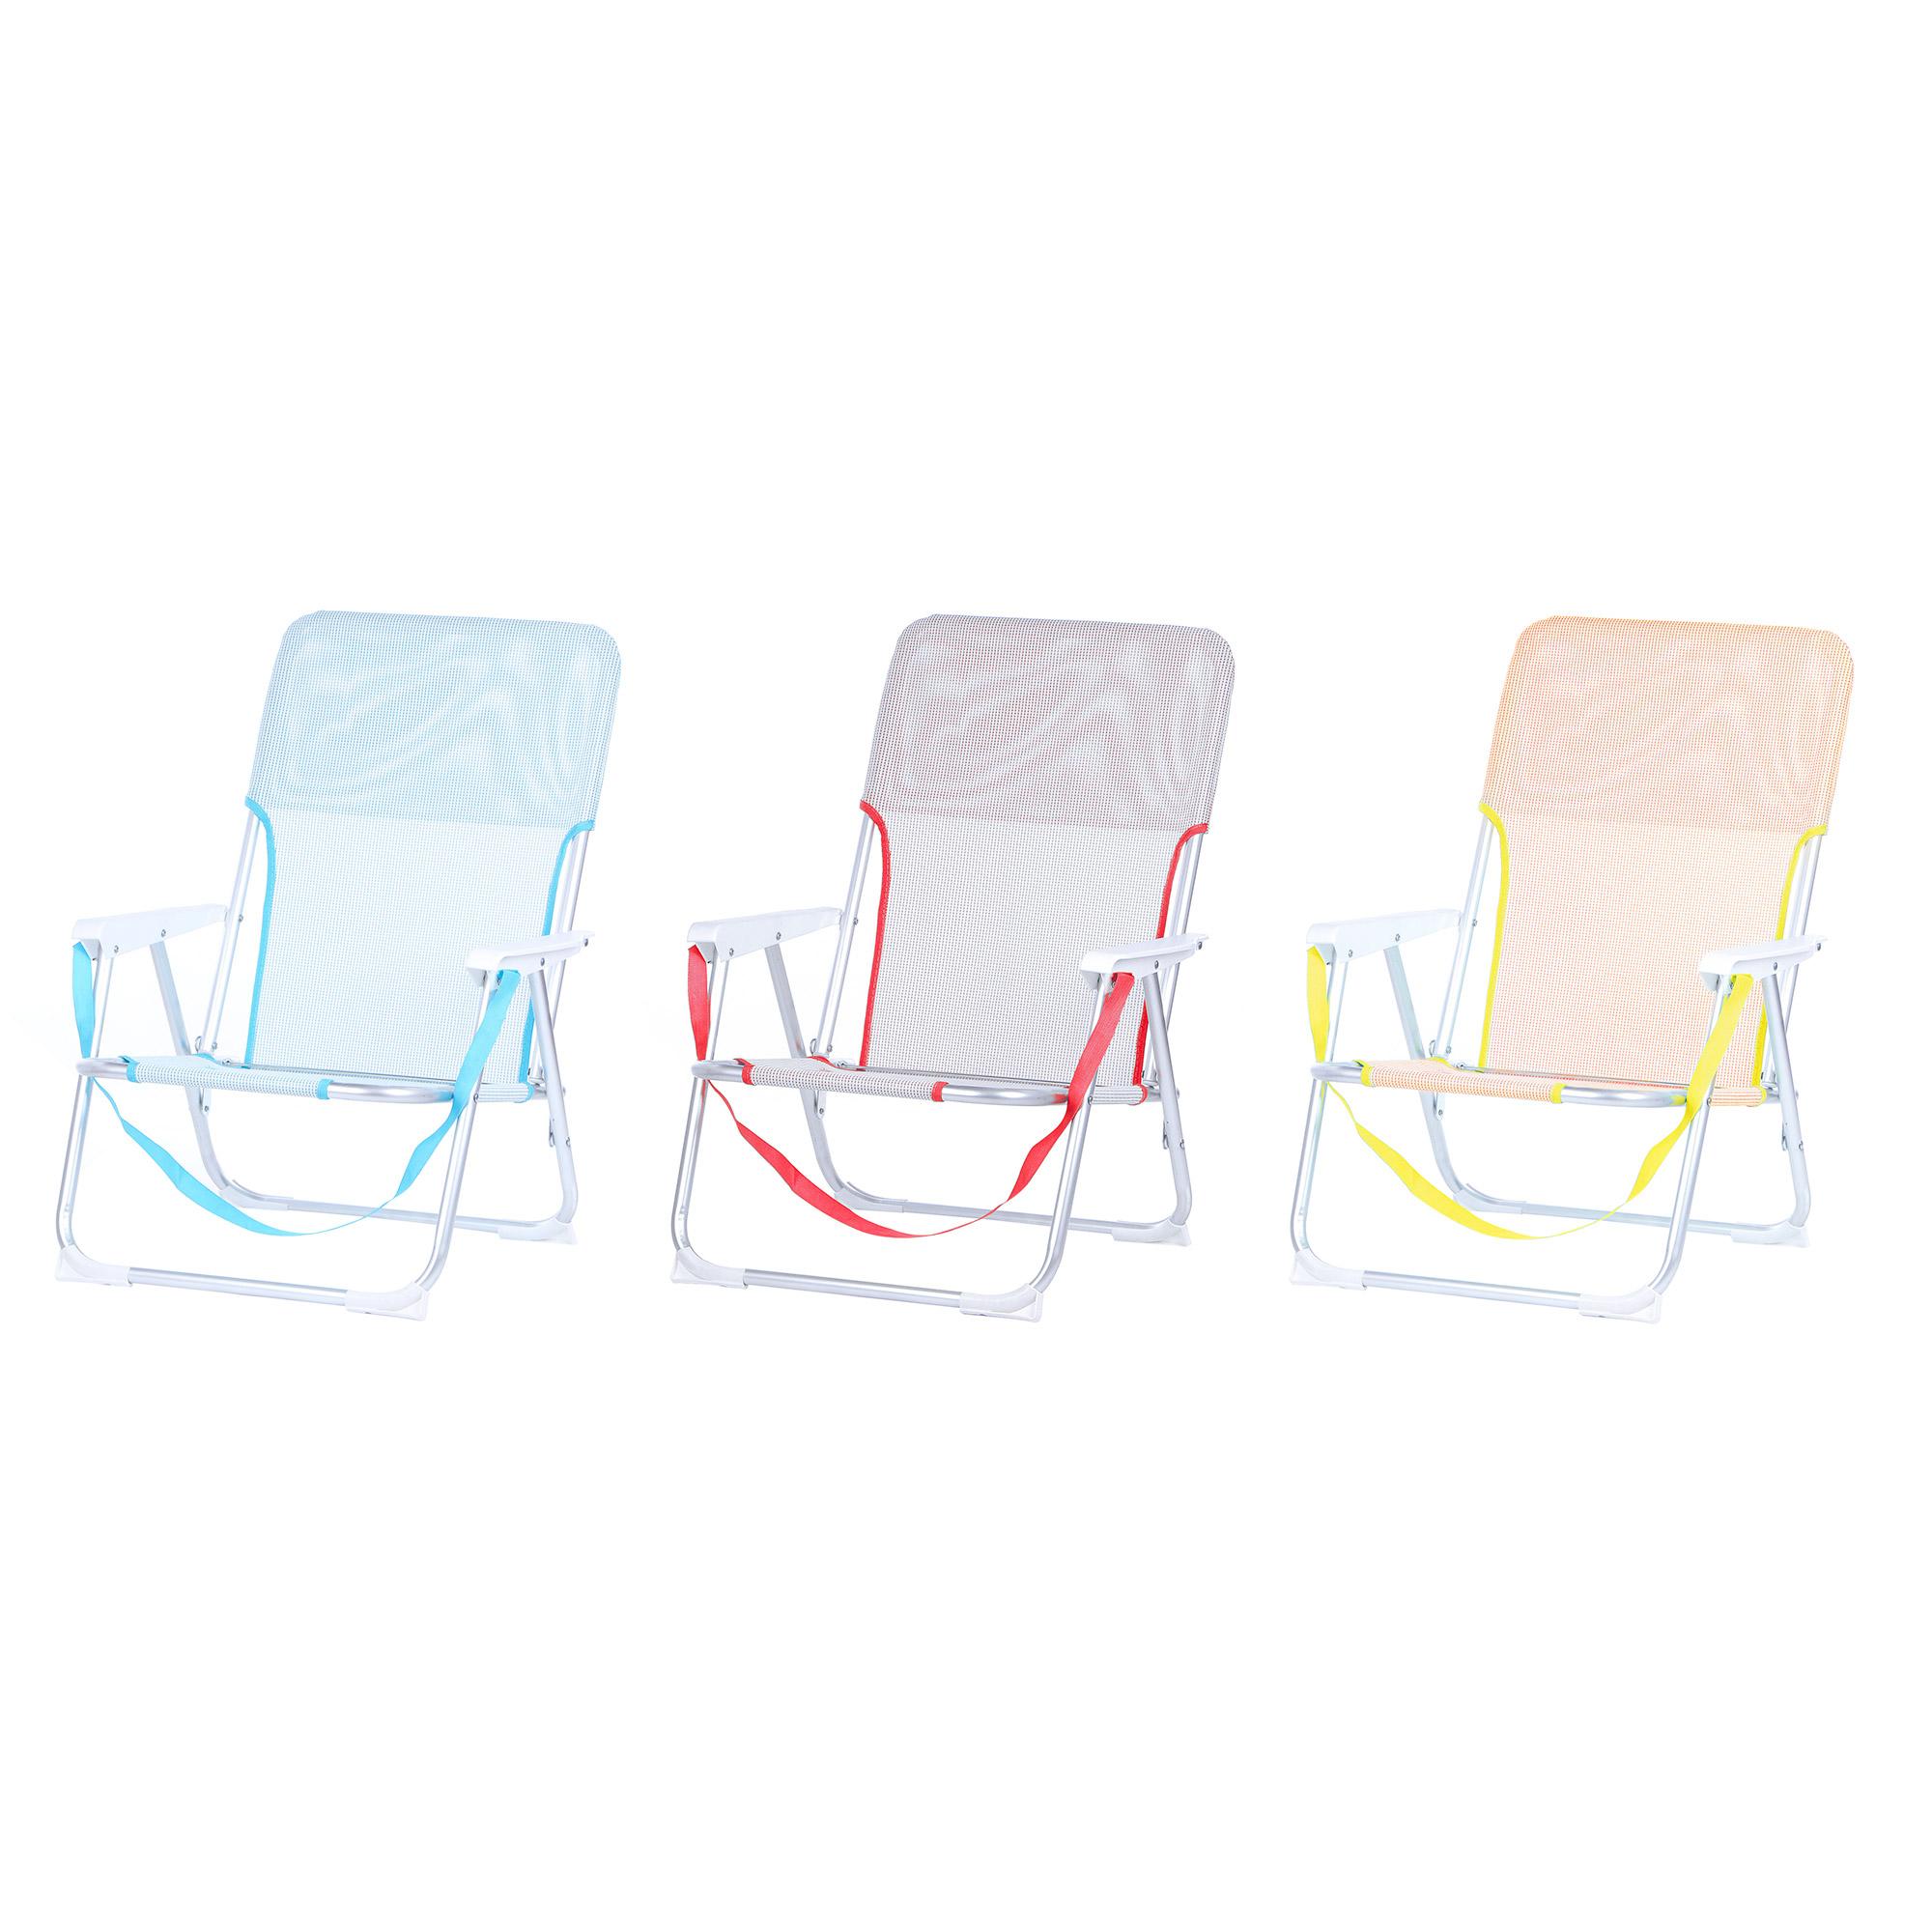 Кресло складное для кемпинга Koopman furniture 40x56x70cm